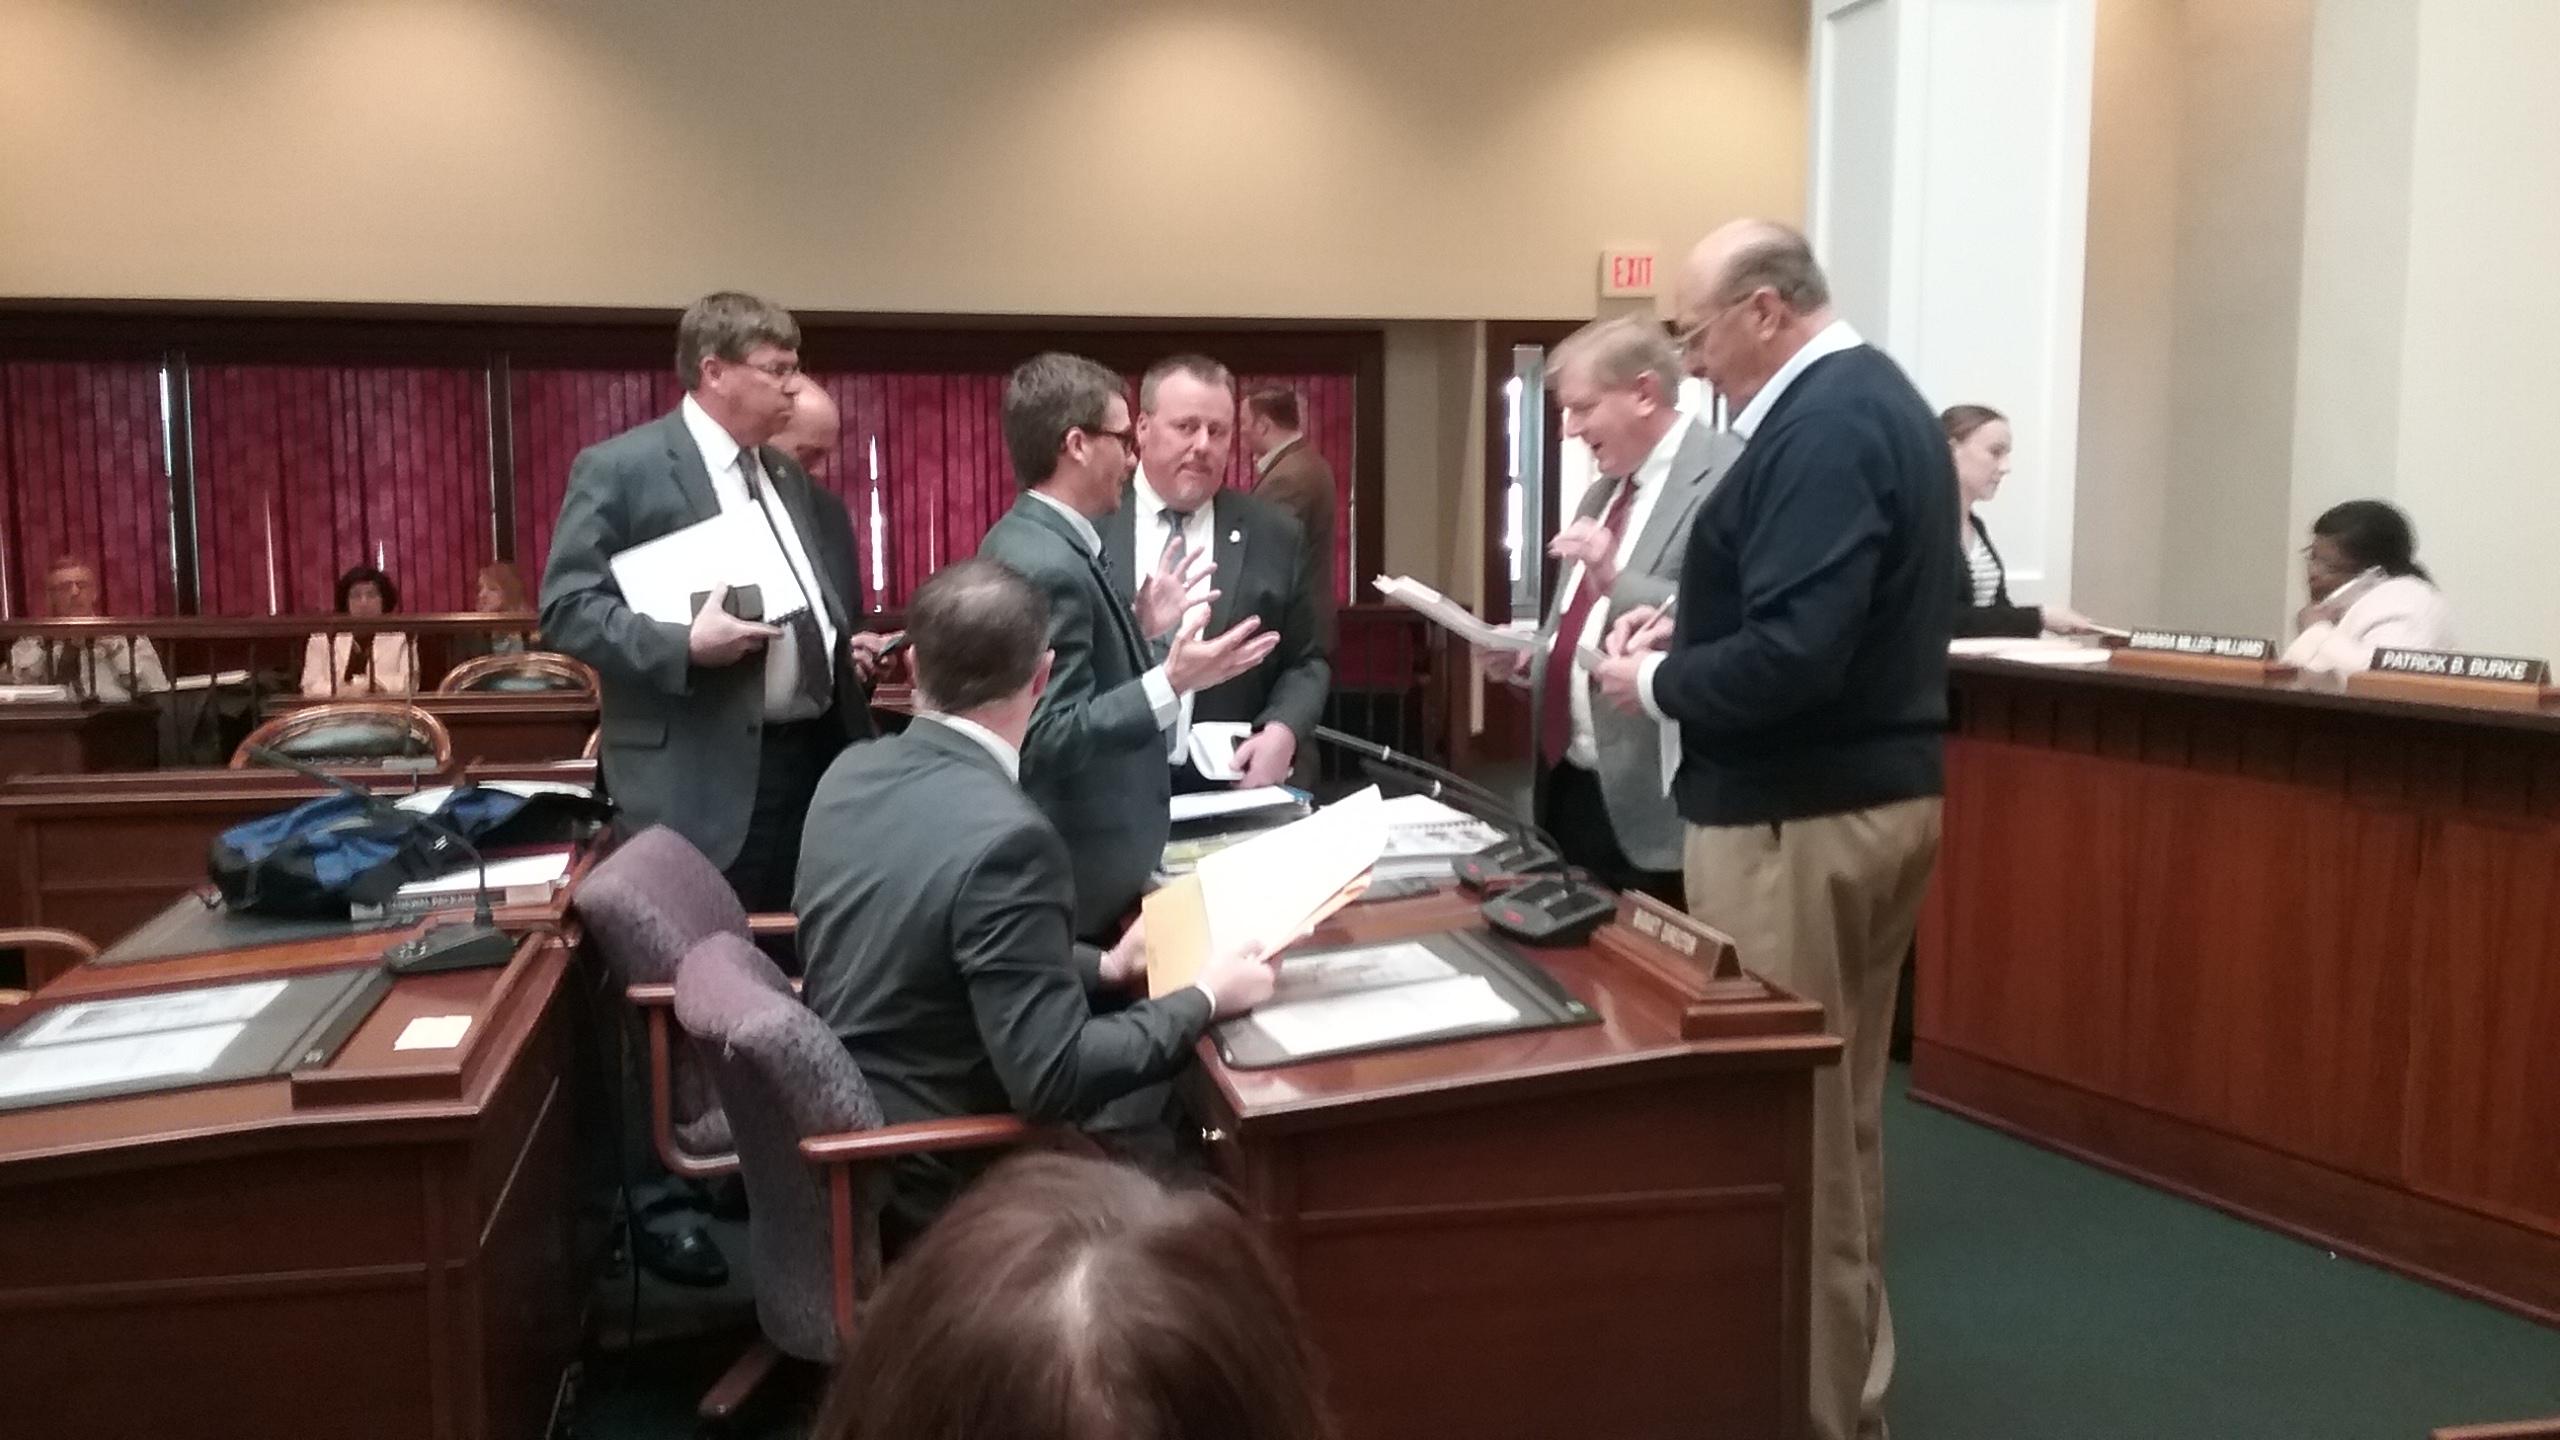 Deputy Budget Director Timothy Callan speaks with Legislator Kevin Hardwick after a  comptroller's hearing before Erie County Legislature in November 2016. (Sandra Tan/Buffalo News)